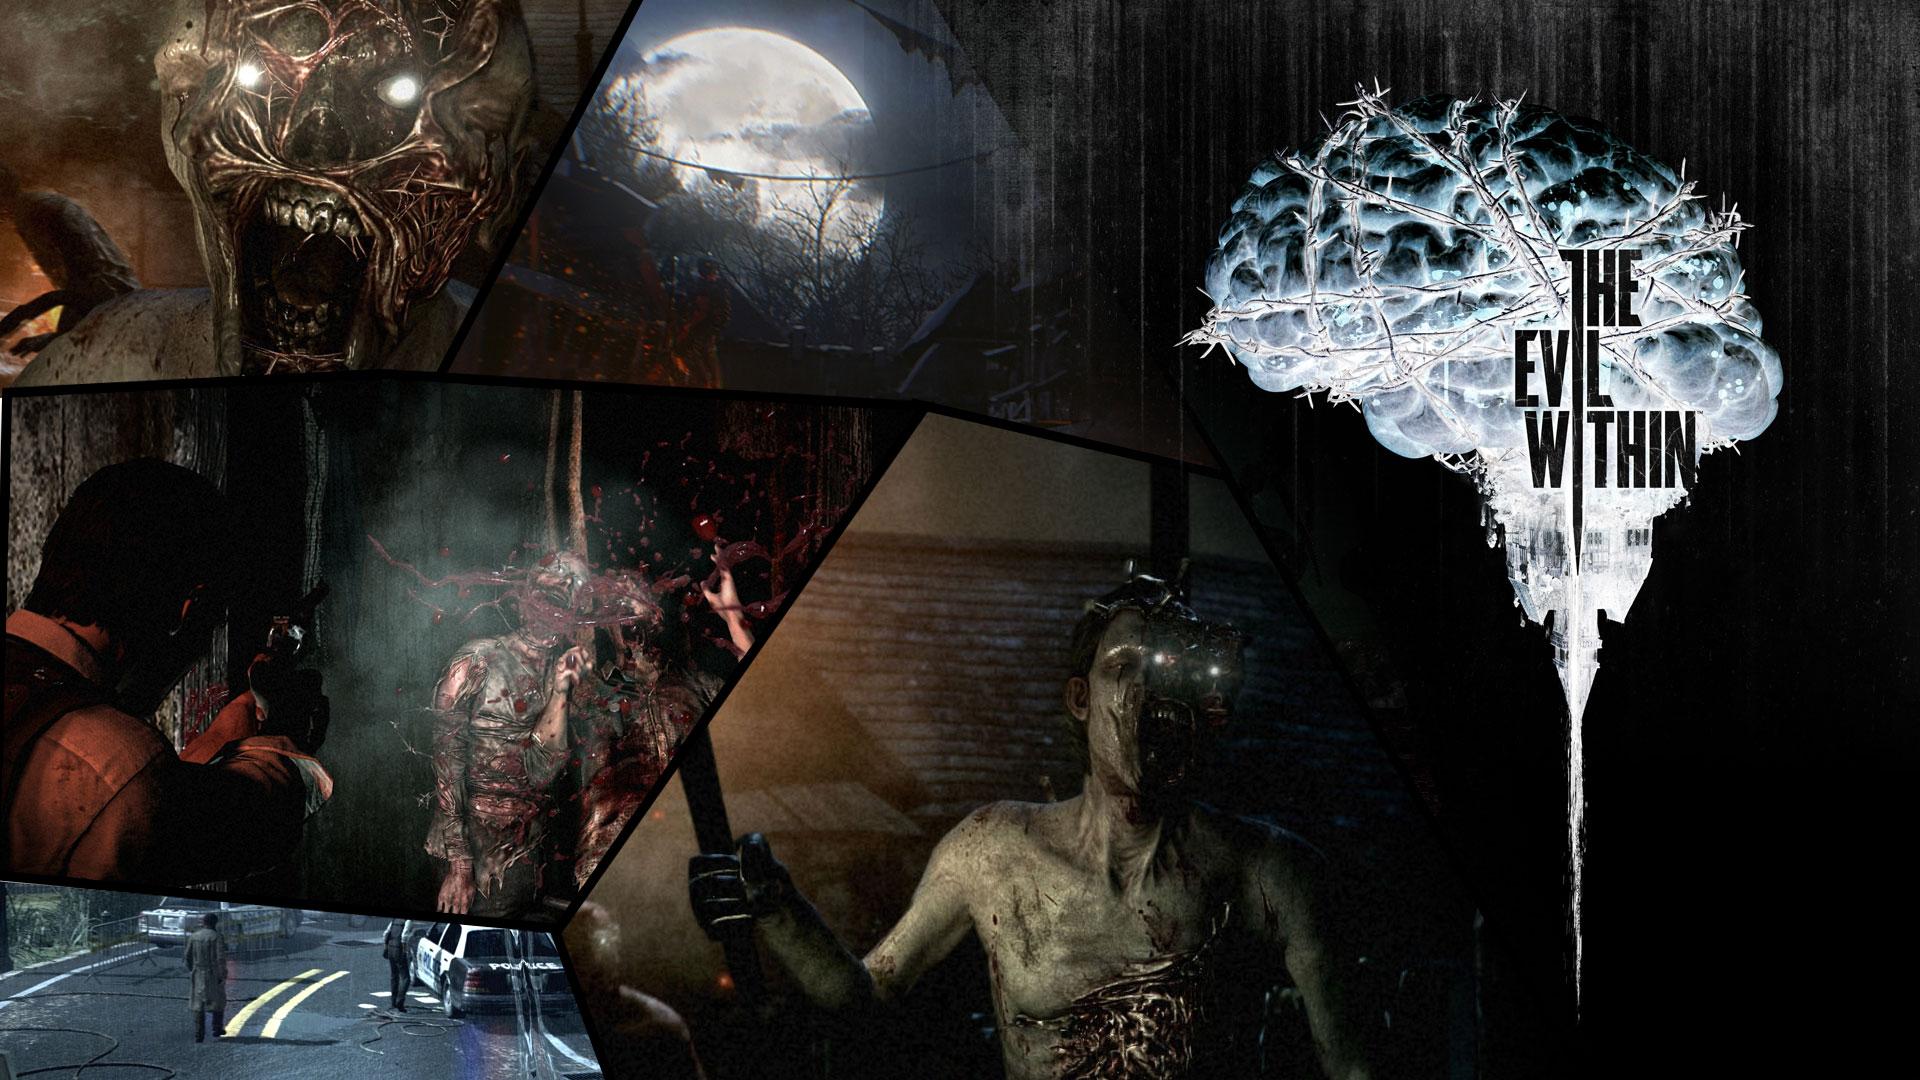 Bethesda lanza un nuevo tráiler de The Evil Within